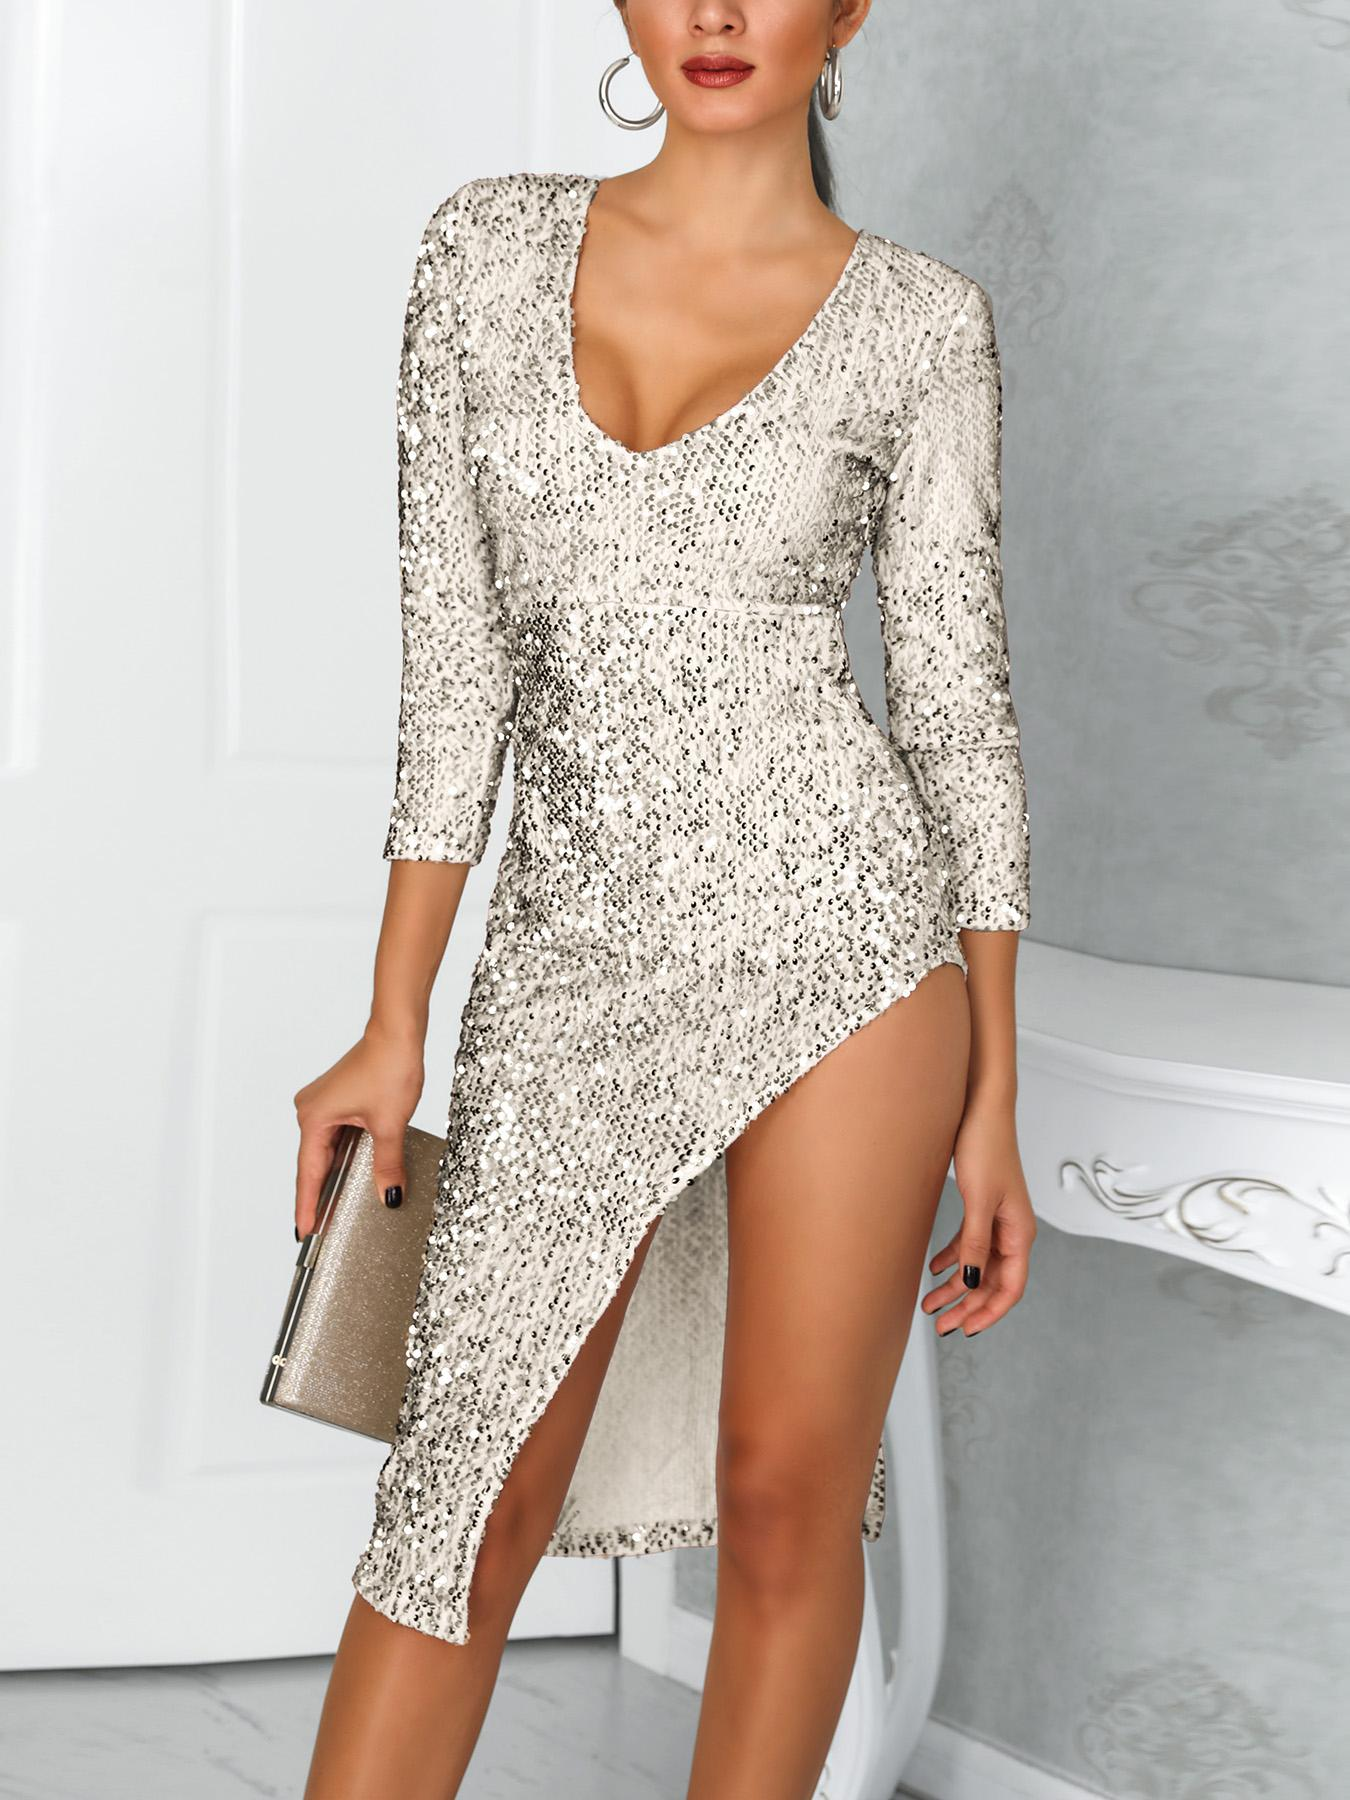 chicme / Vestido de lentejuelas con manga larga y abertura profunda de V